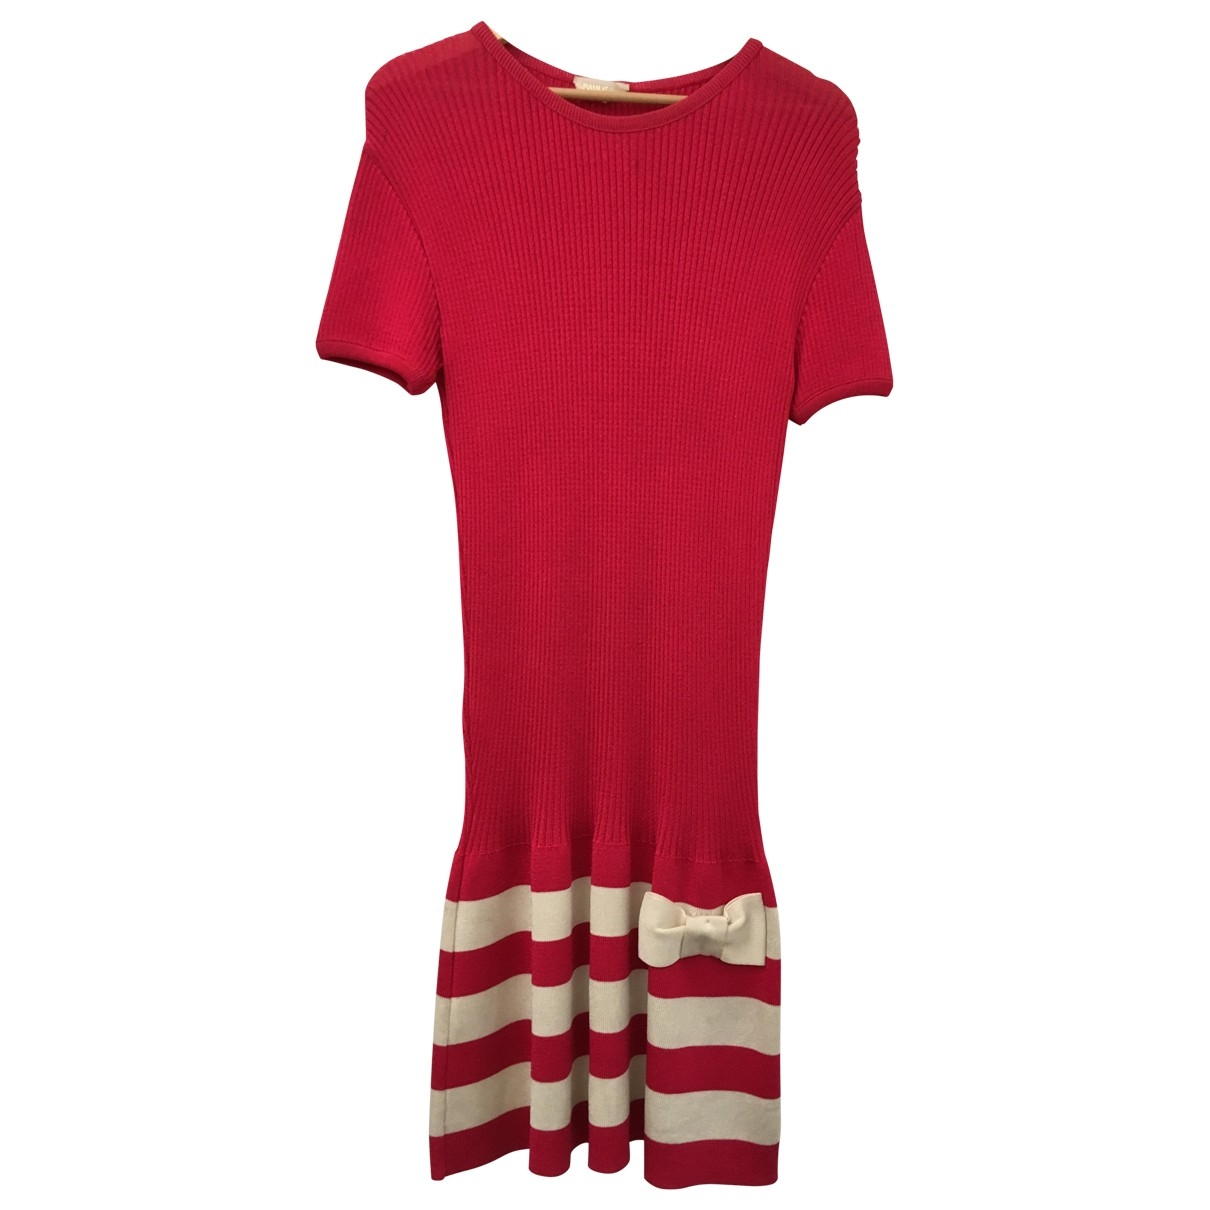 Paule Ka \N Pink Cotton - elasthane dress for Women 38 FR